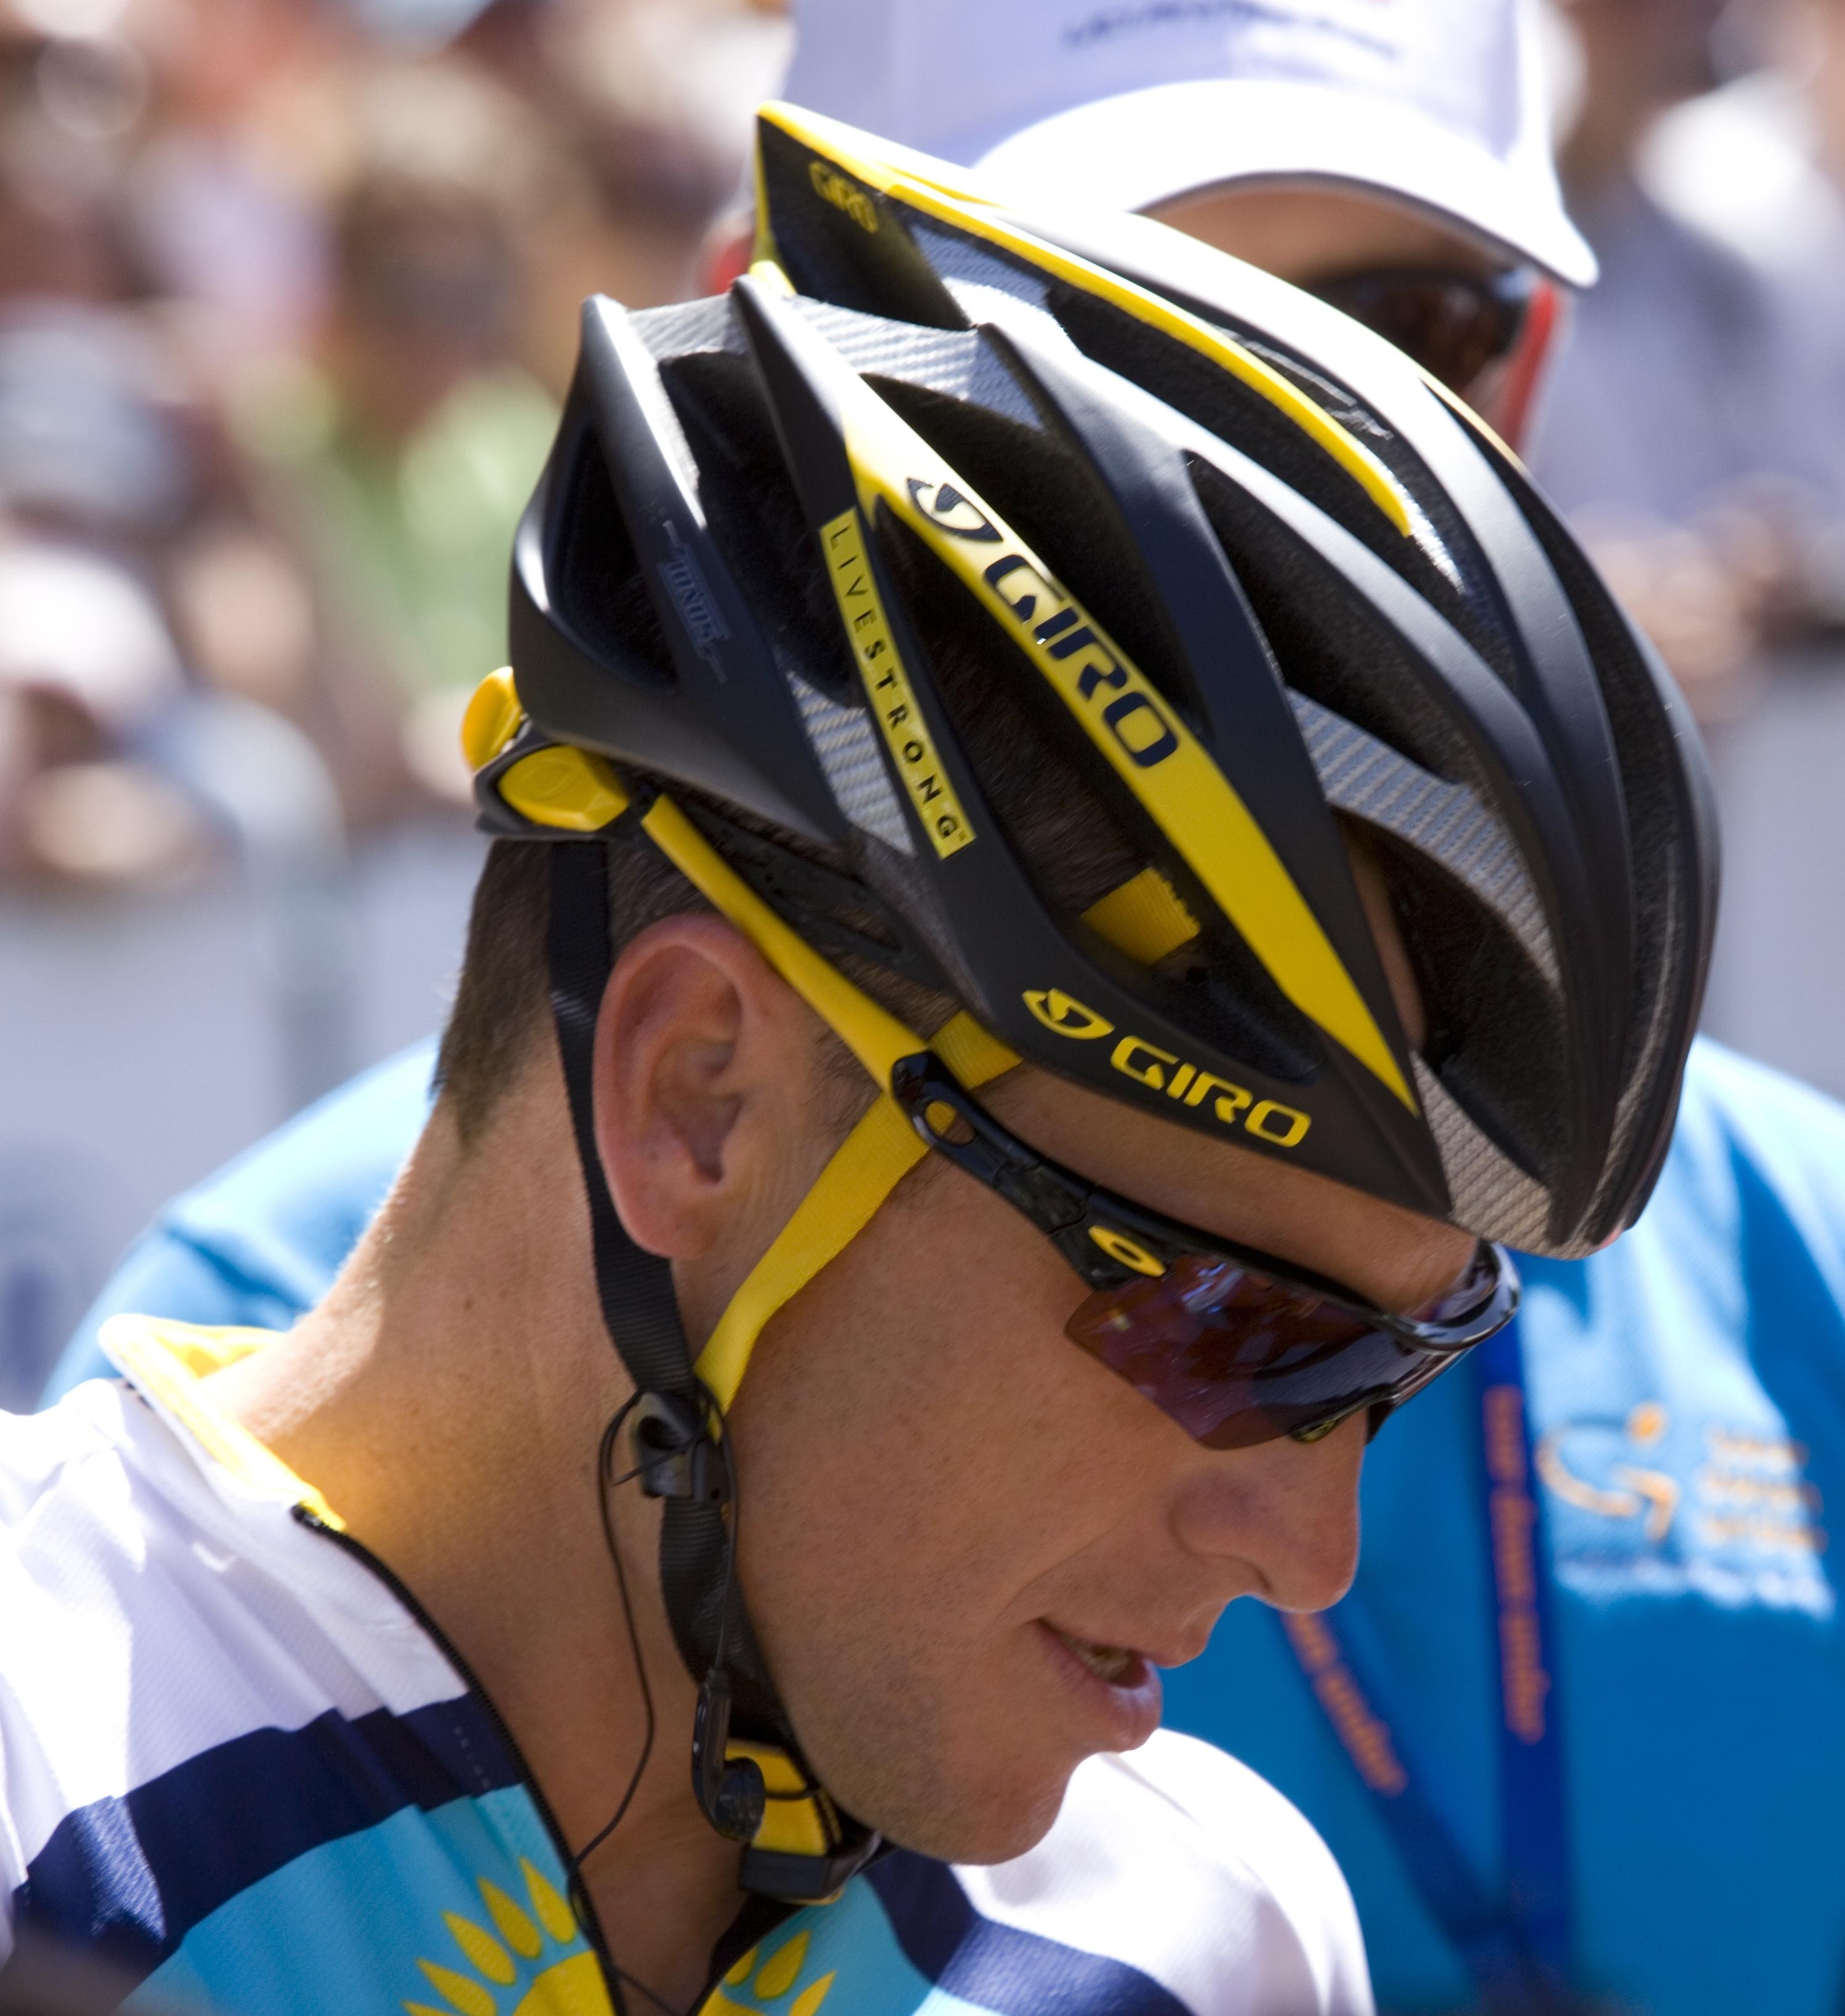 File:Lance Armstrong January 20, 2009.jpg - Wikimedia Commons